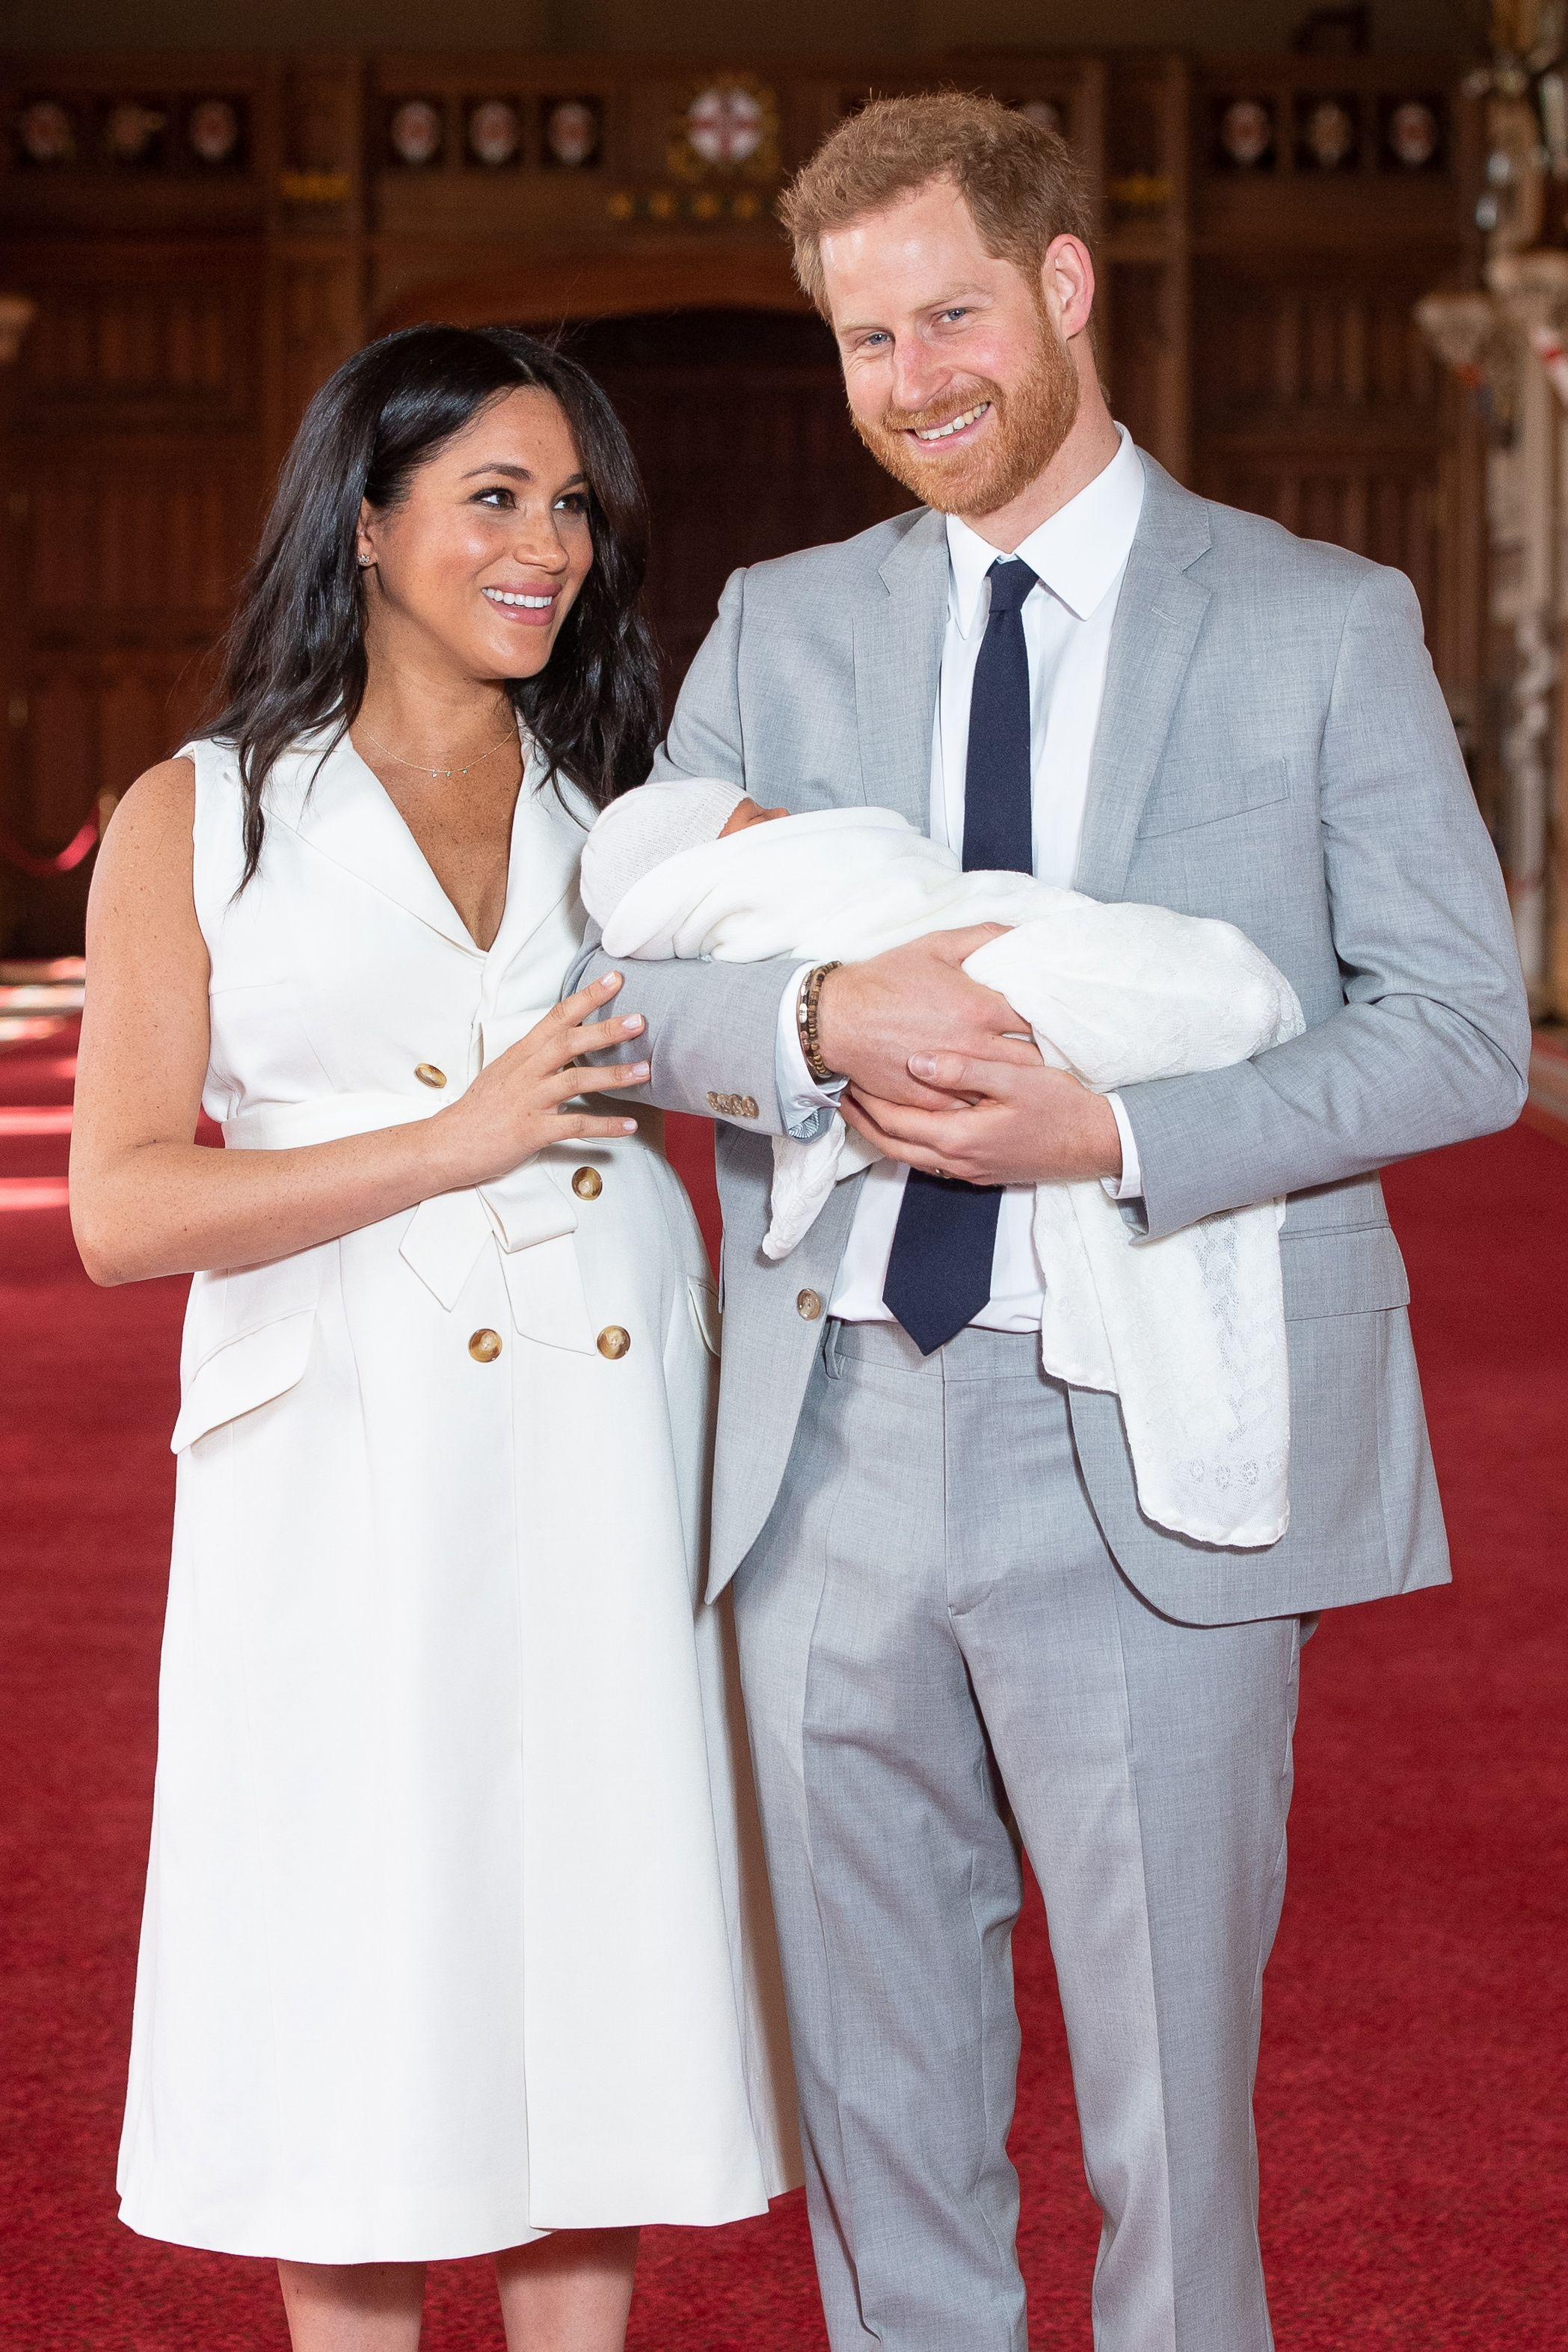 Meghan Markle y Príncipe Harry, Archie